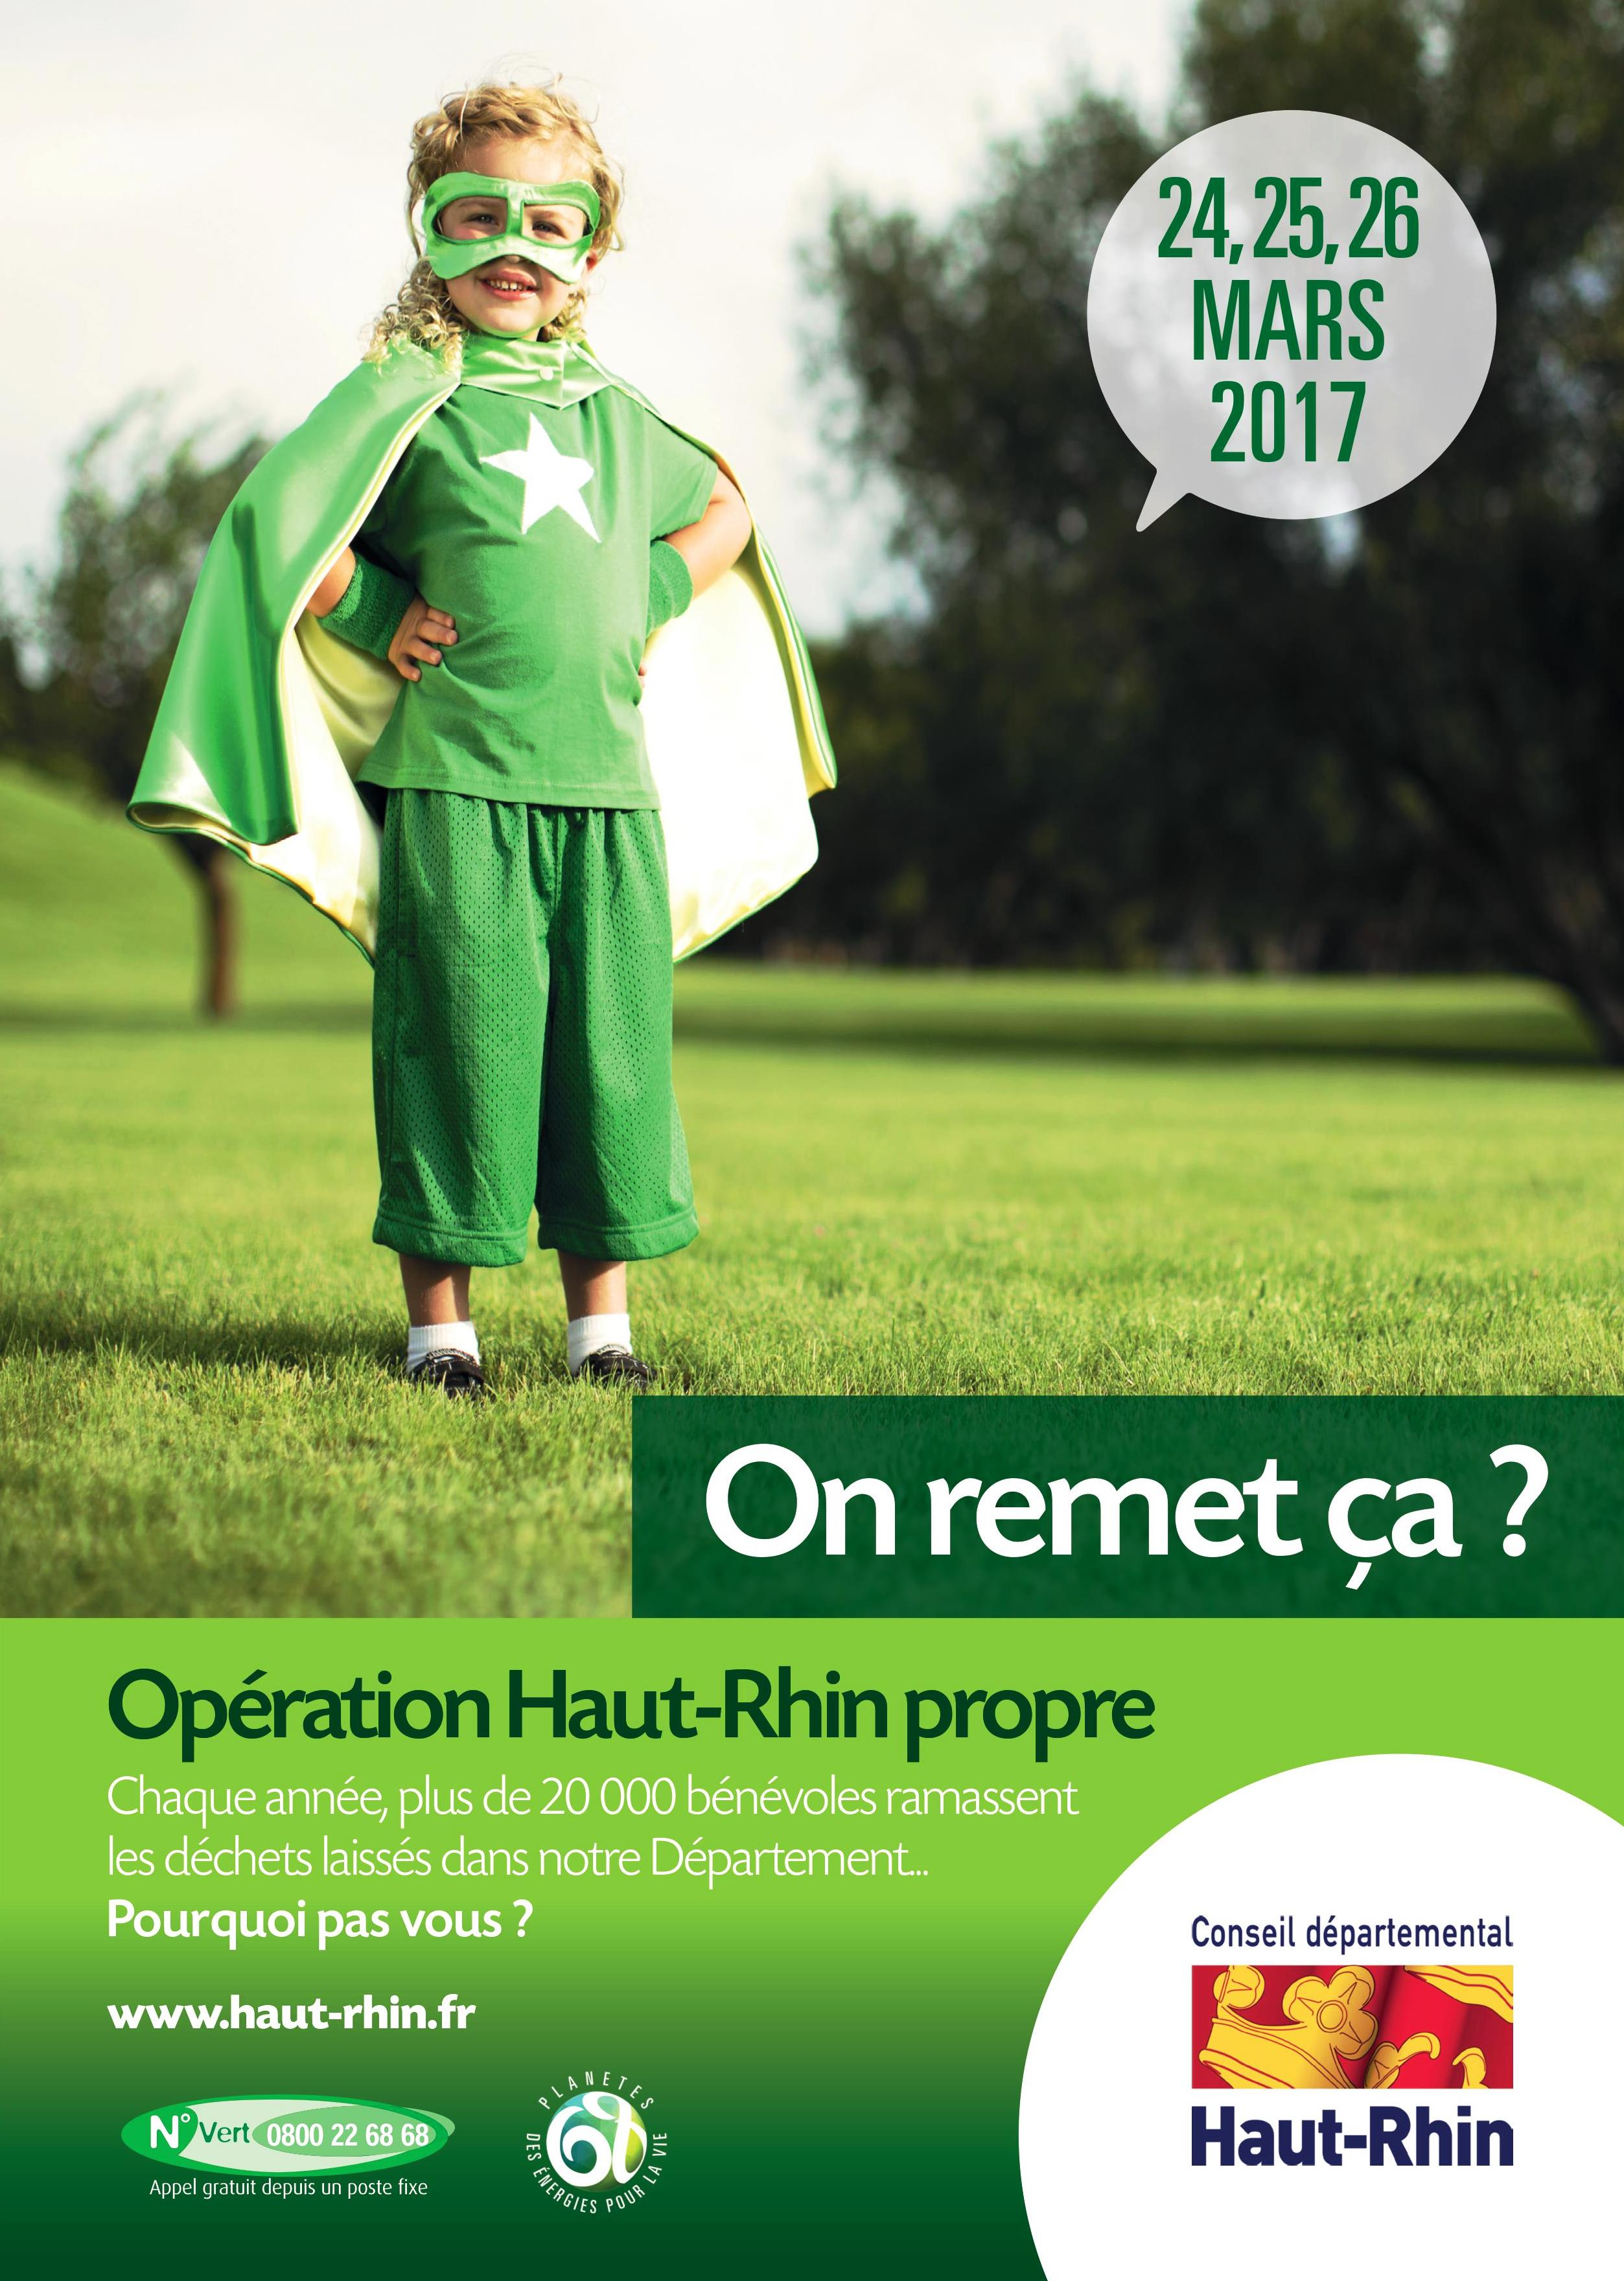 Haut-Rhin Propre 2017 (1)